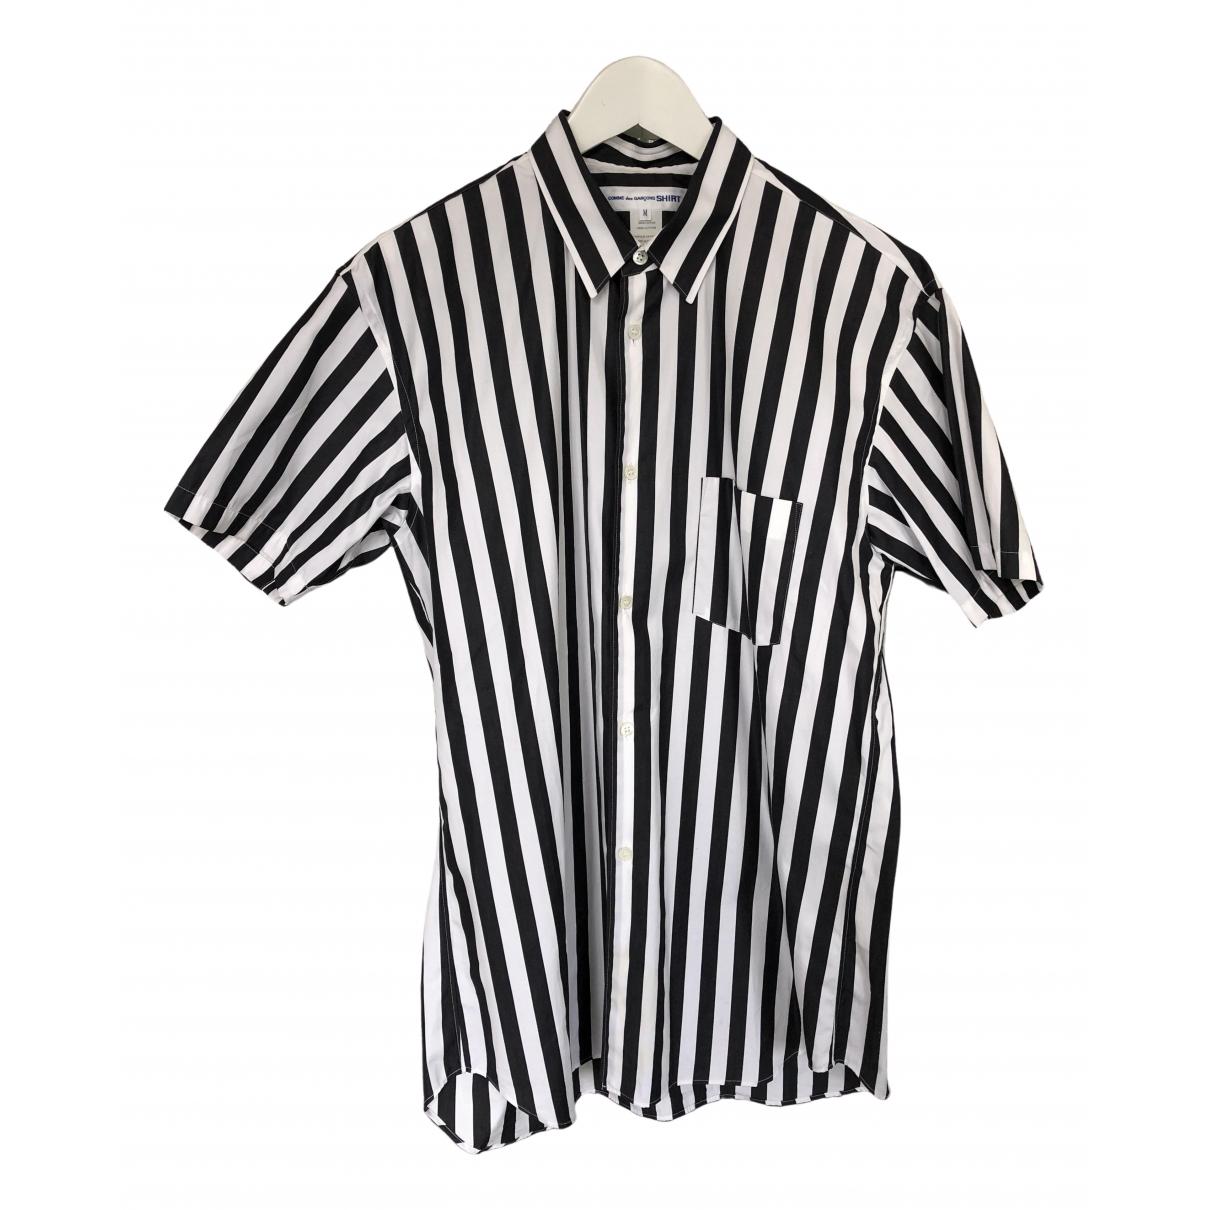 Comme Des Garcons \N White Cotton Shirts for Men M International